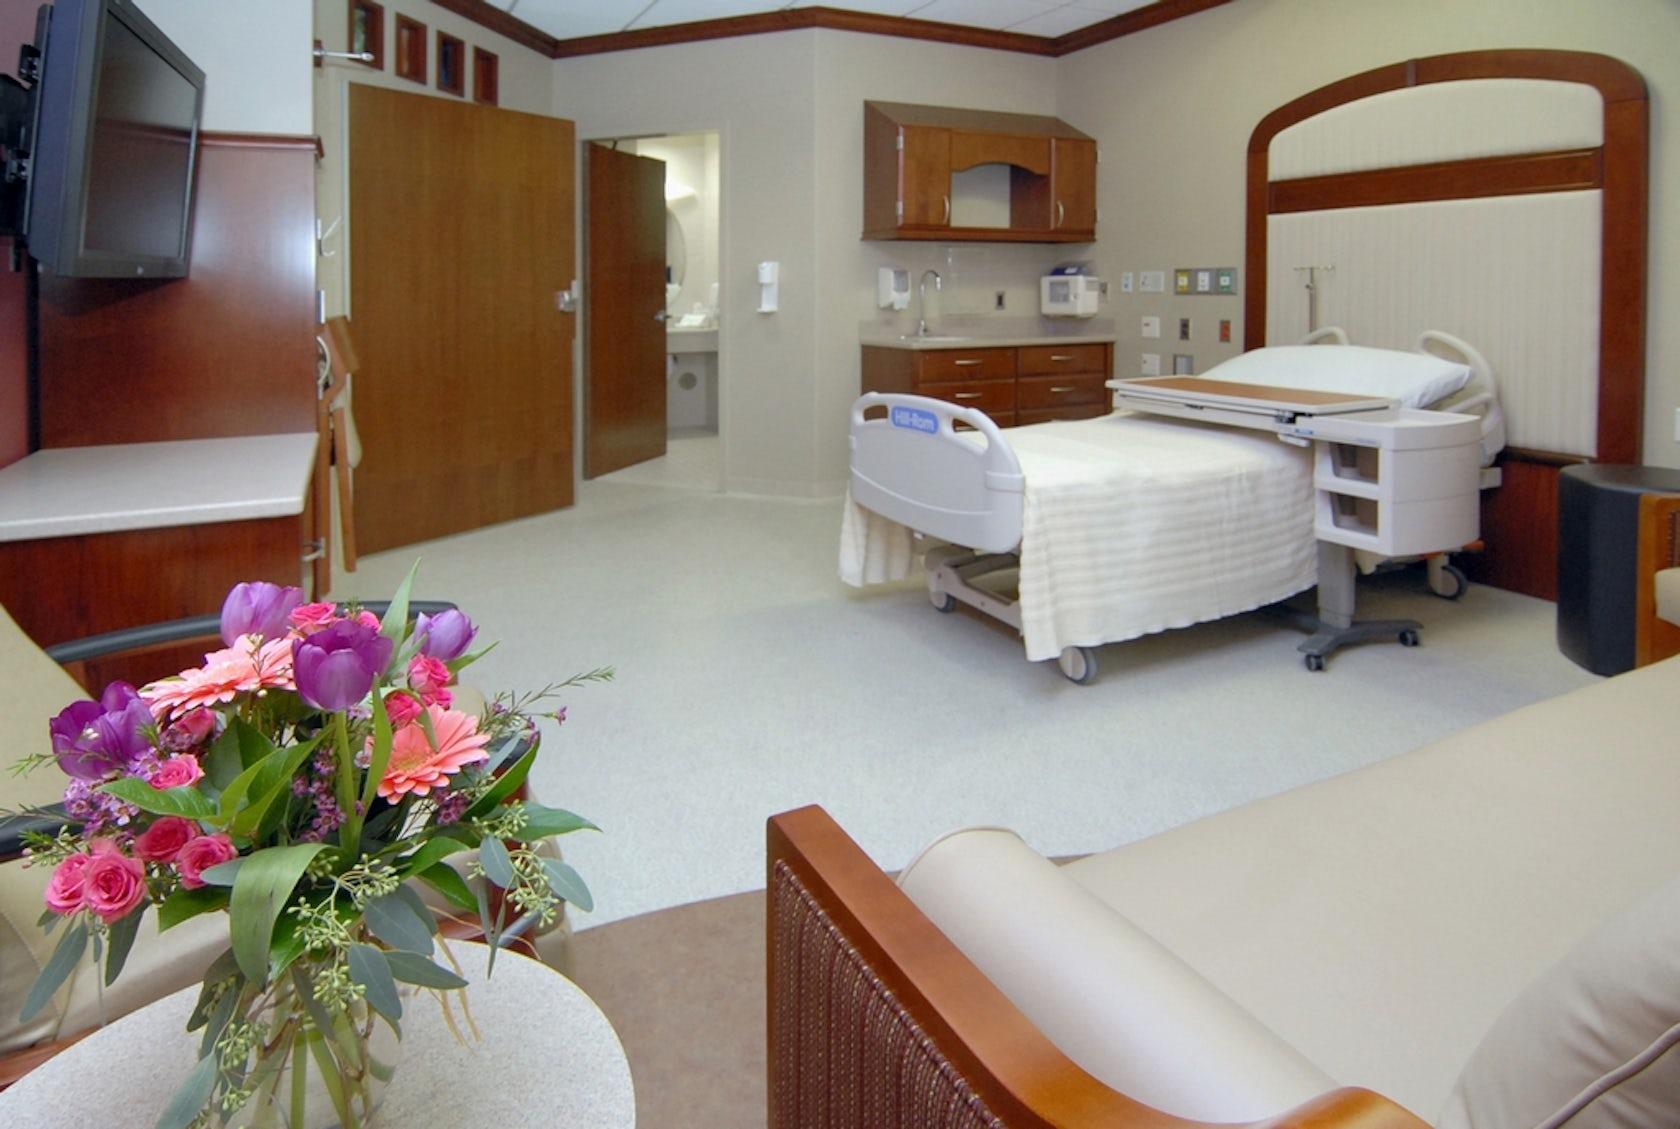 Indiana University Hospital >> Henry Ford West Bloomfield Hospital - Architizer